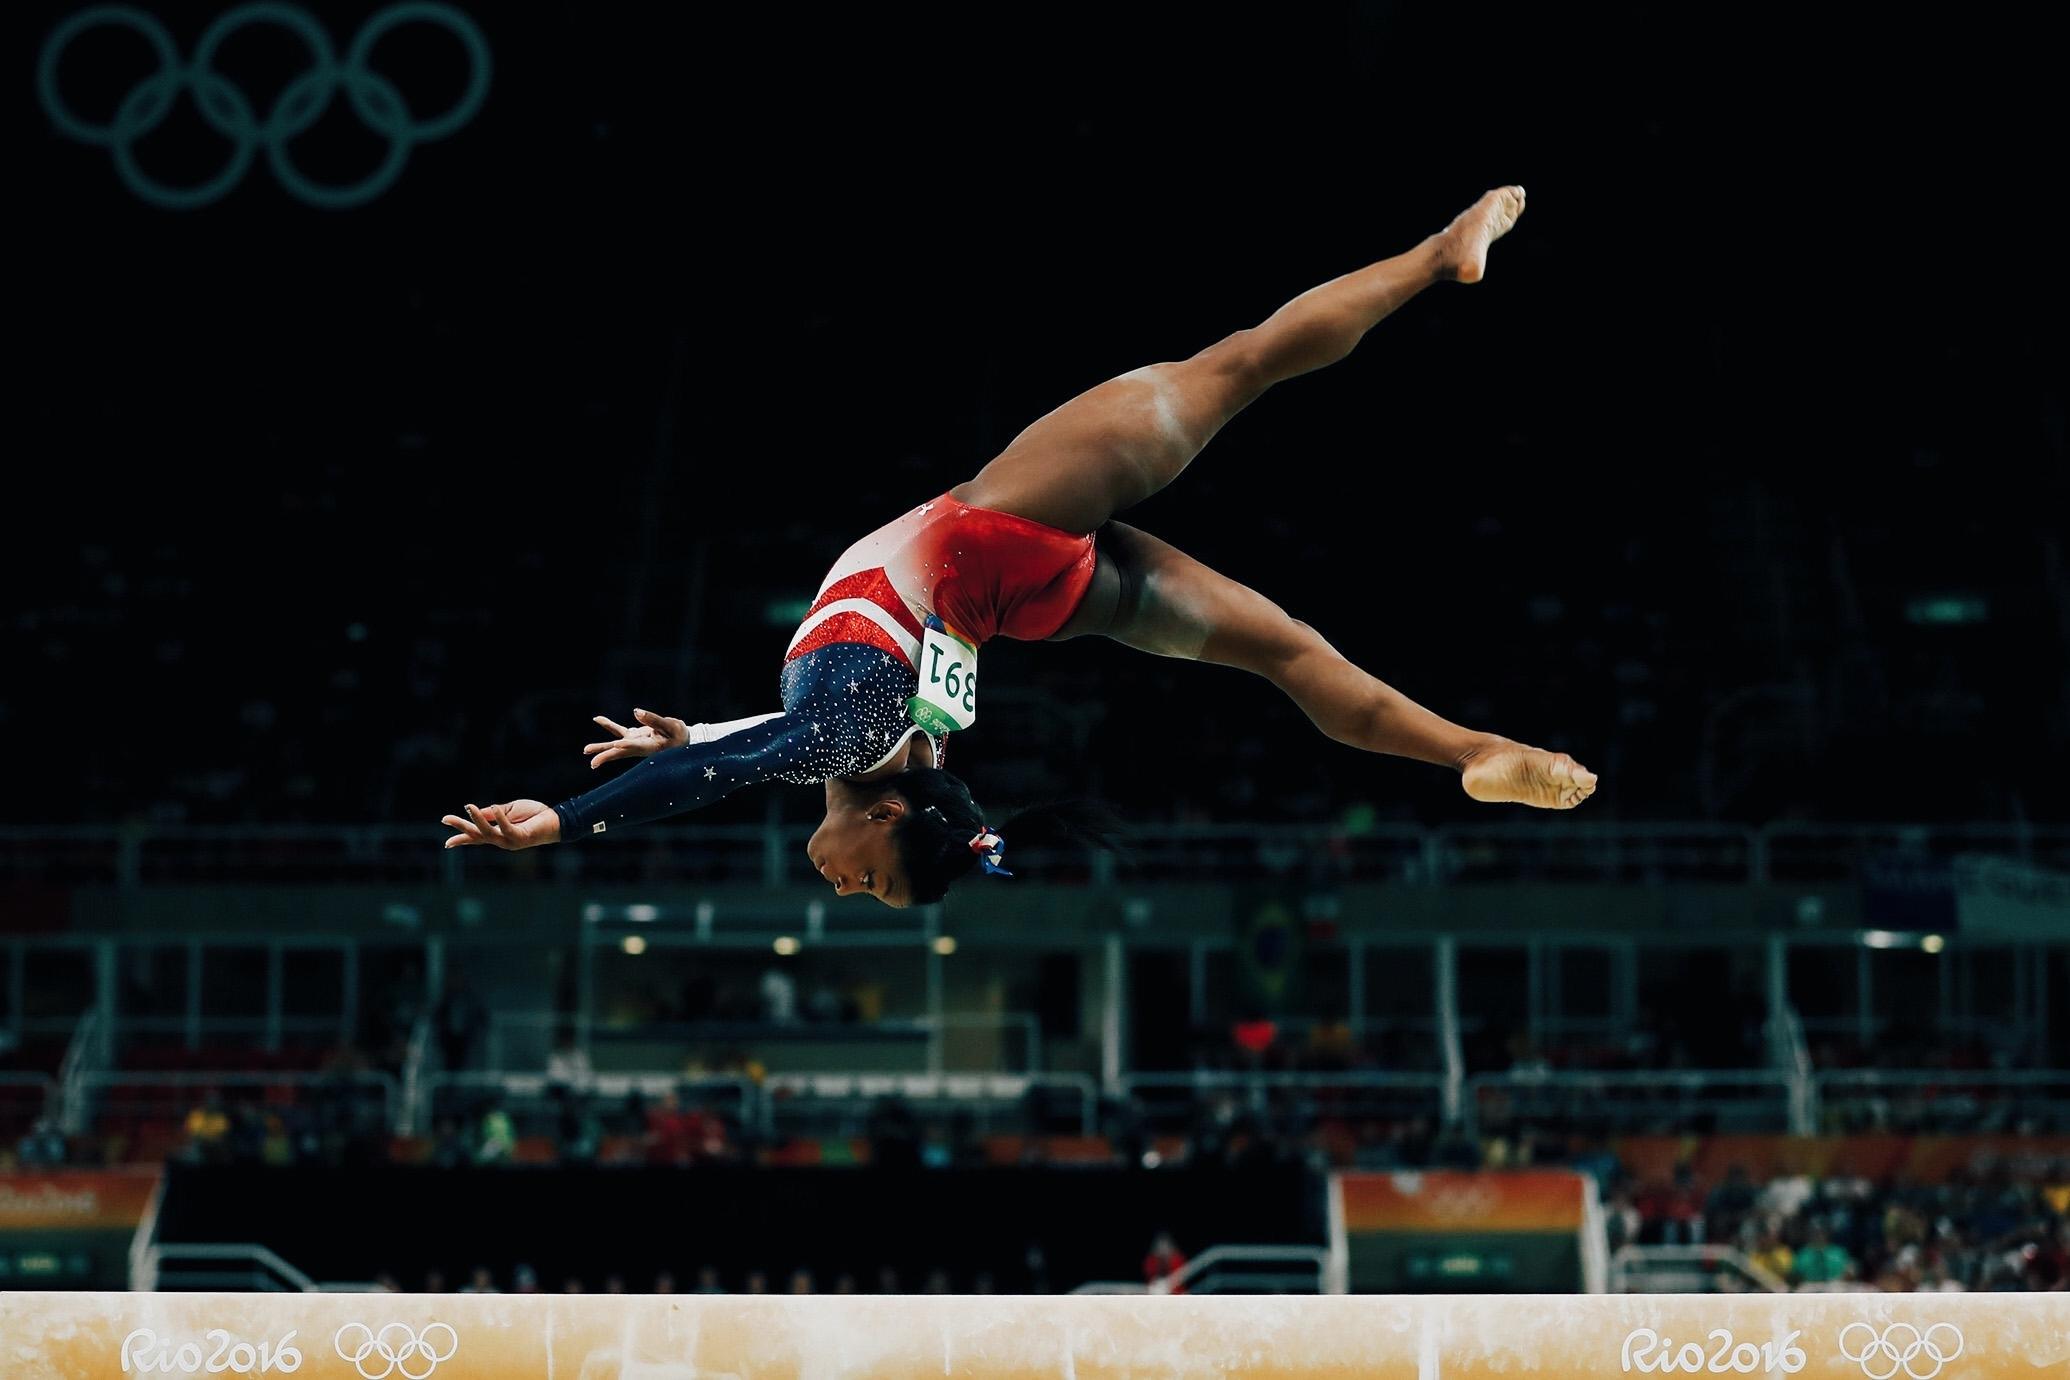 sex-abuse-scandal-gymnastics-womens-sport.jpg